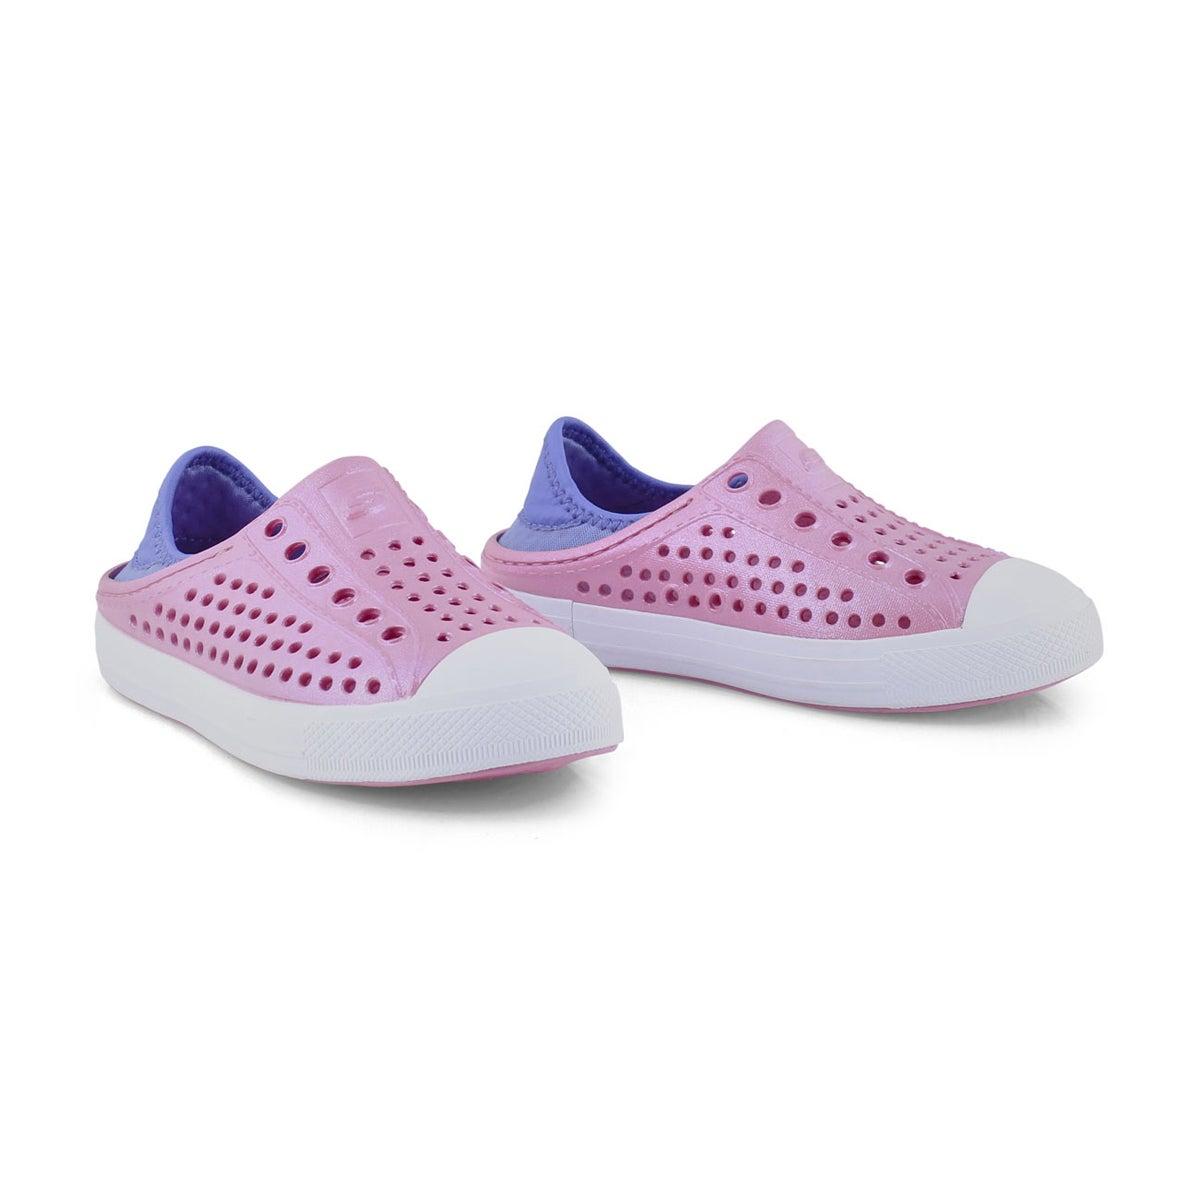 Grls Guzman Steps pnk/blue slip on shoe